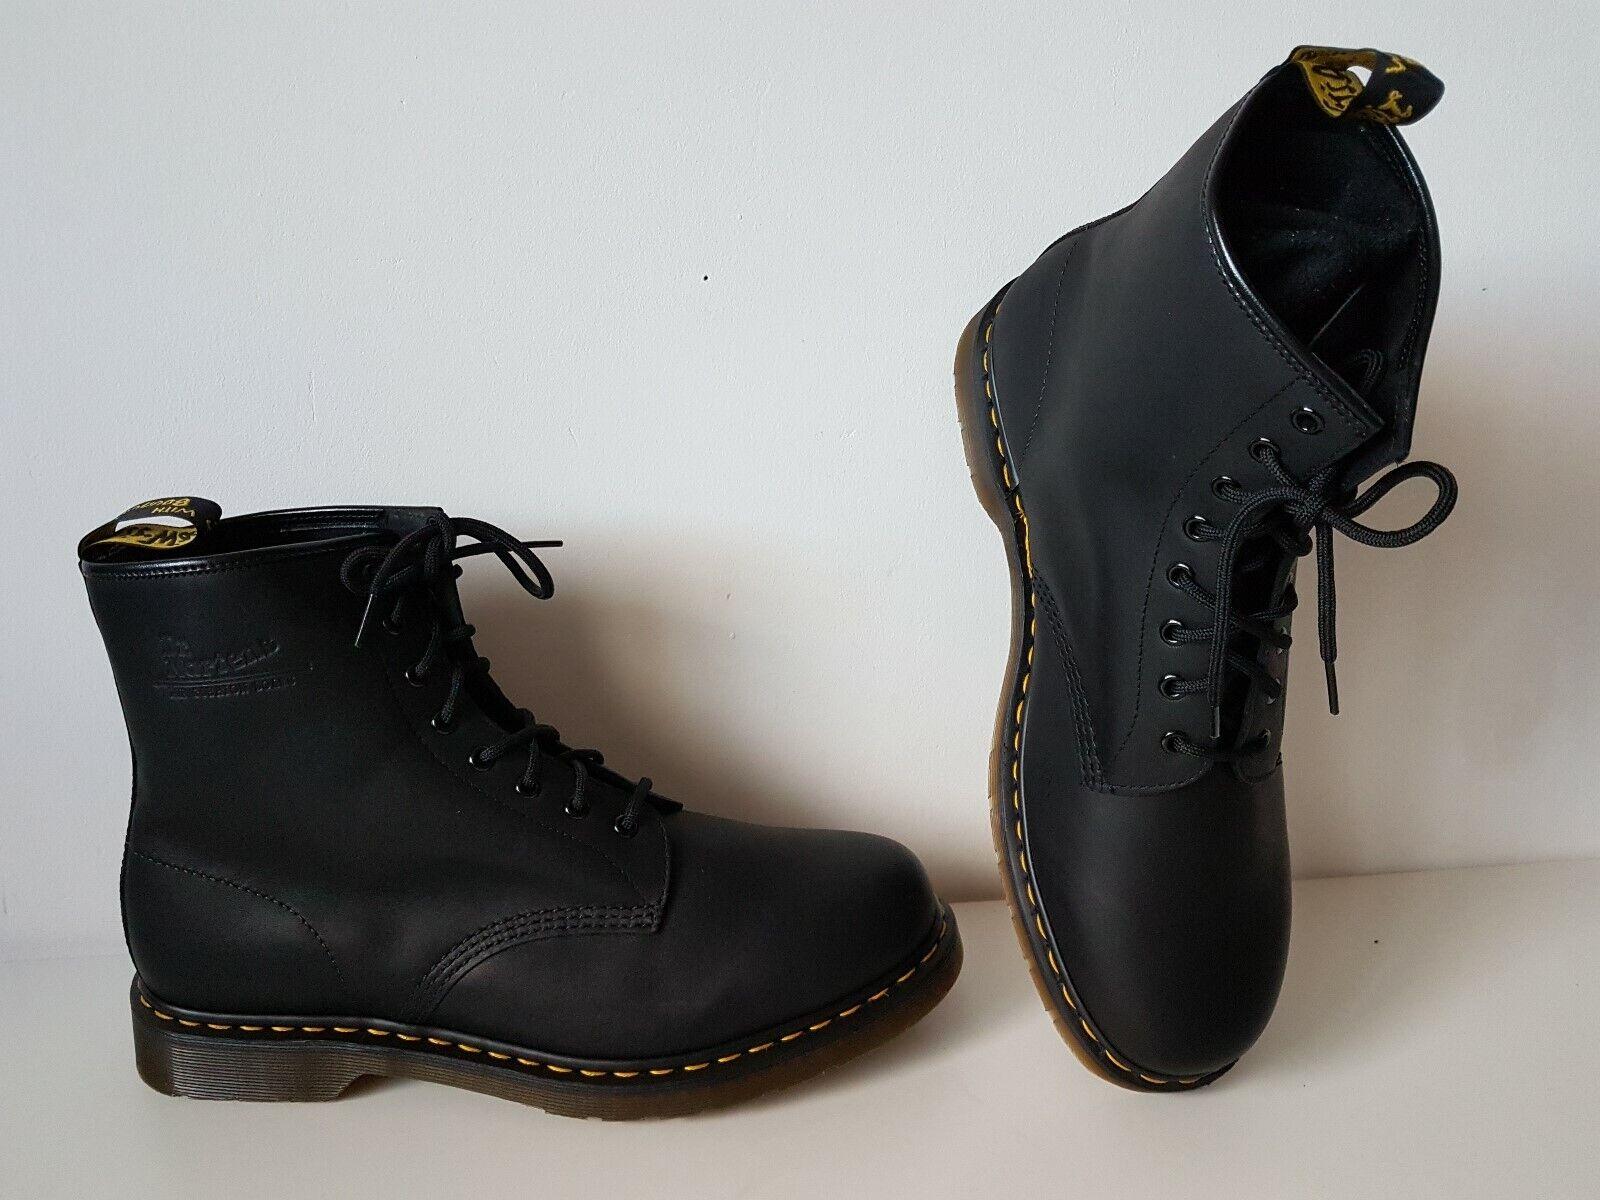 UK 13 EU 48 US 14 Dr. Martens 1460 black Boots 8 eye leather greasy